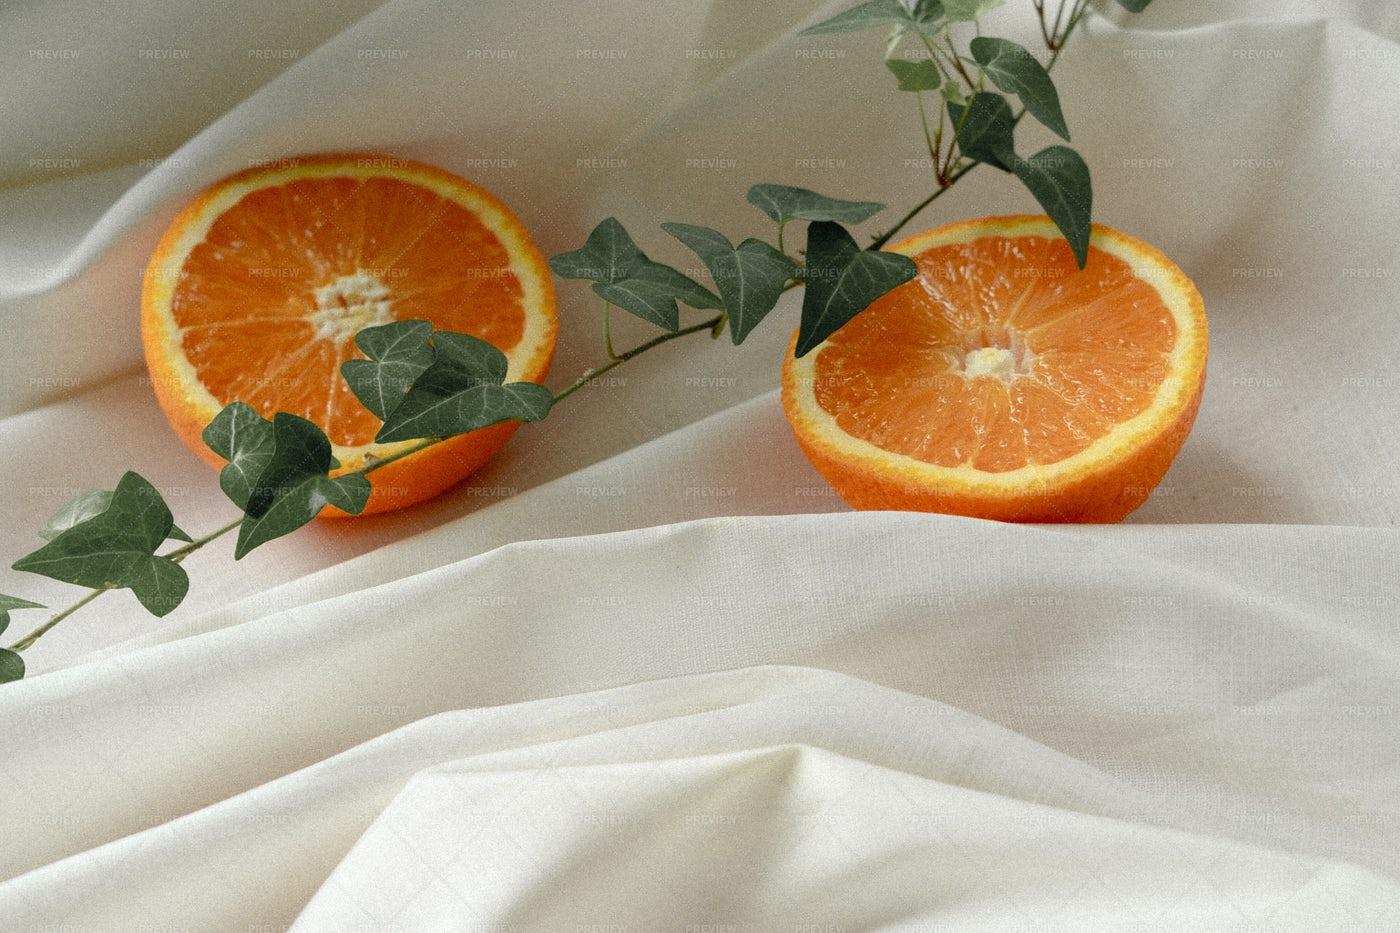 Oranges On A Tablecloth: Stock Photos